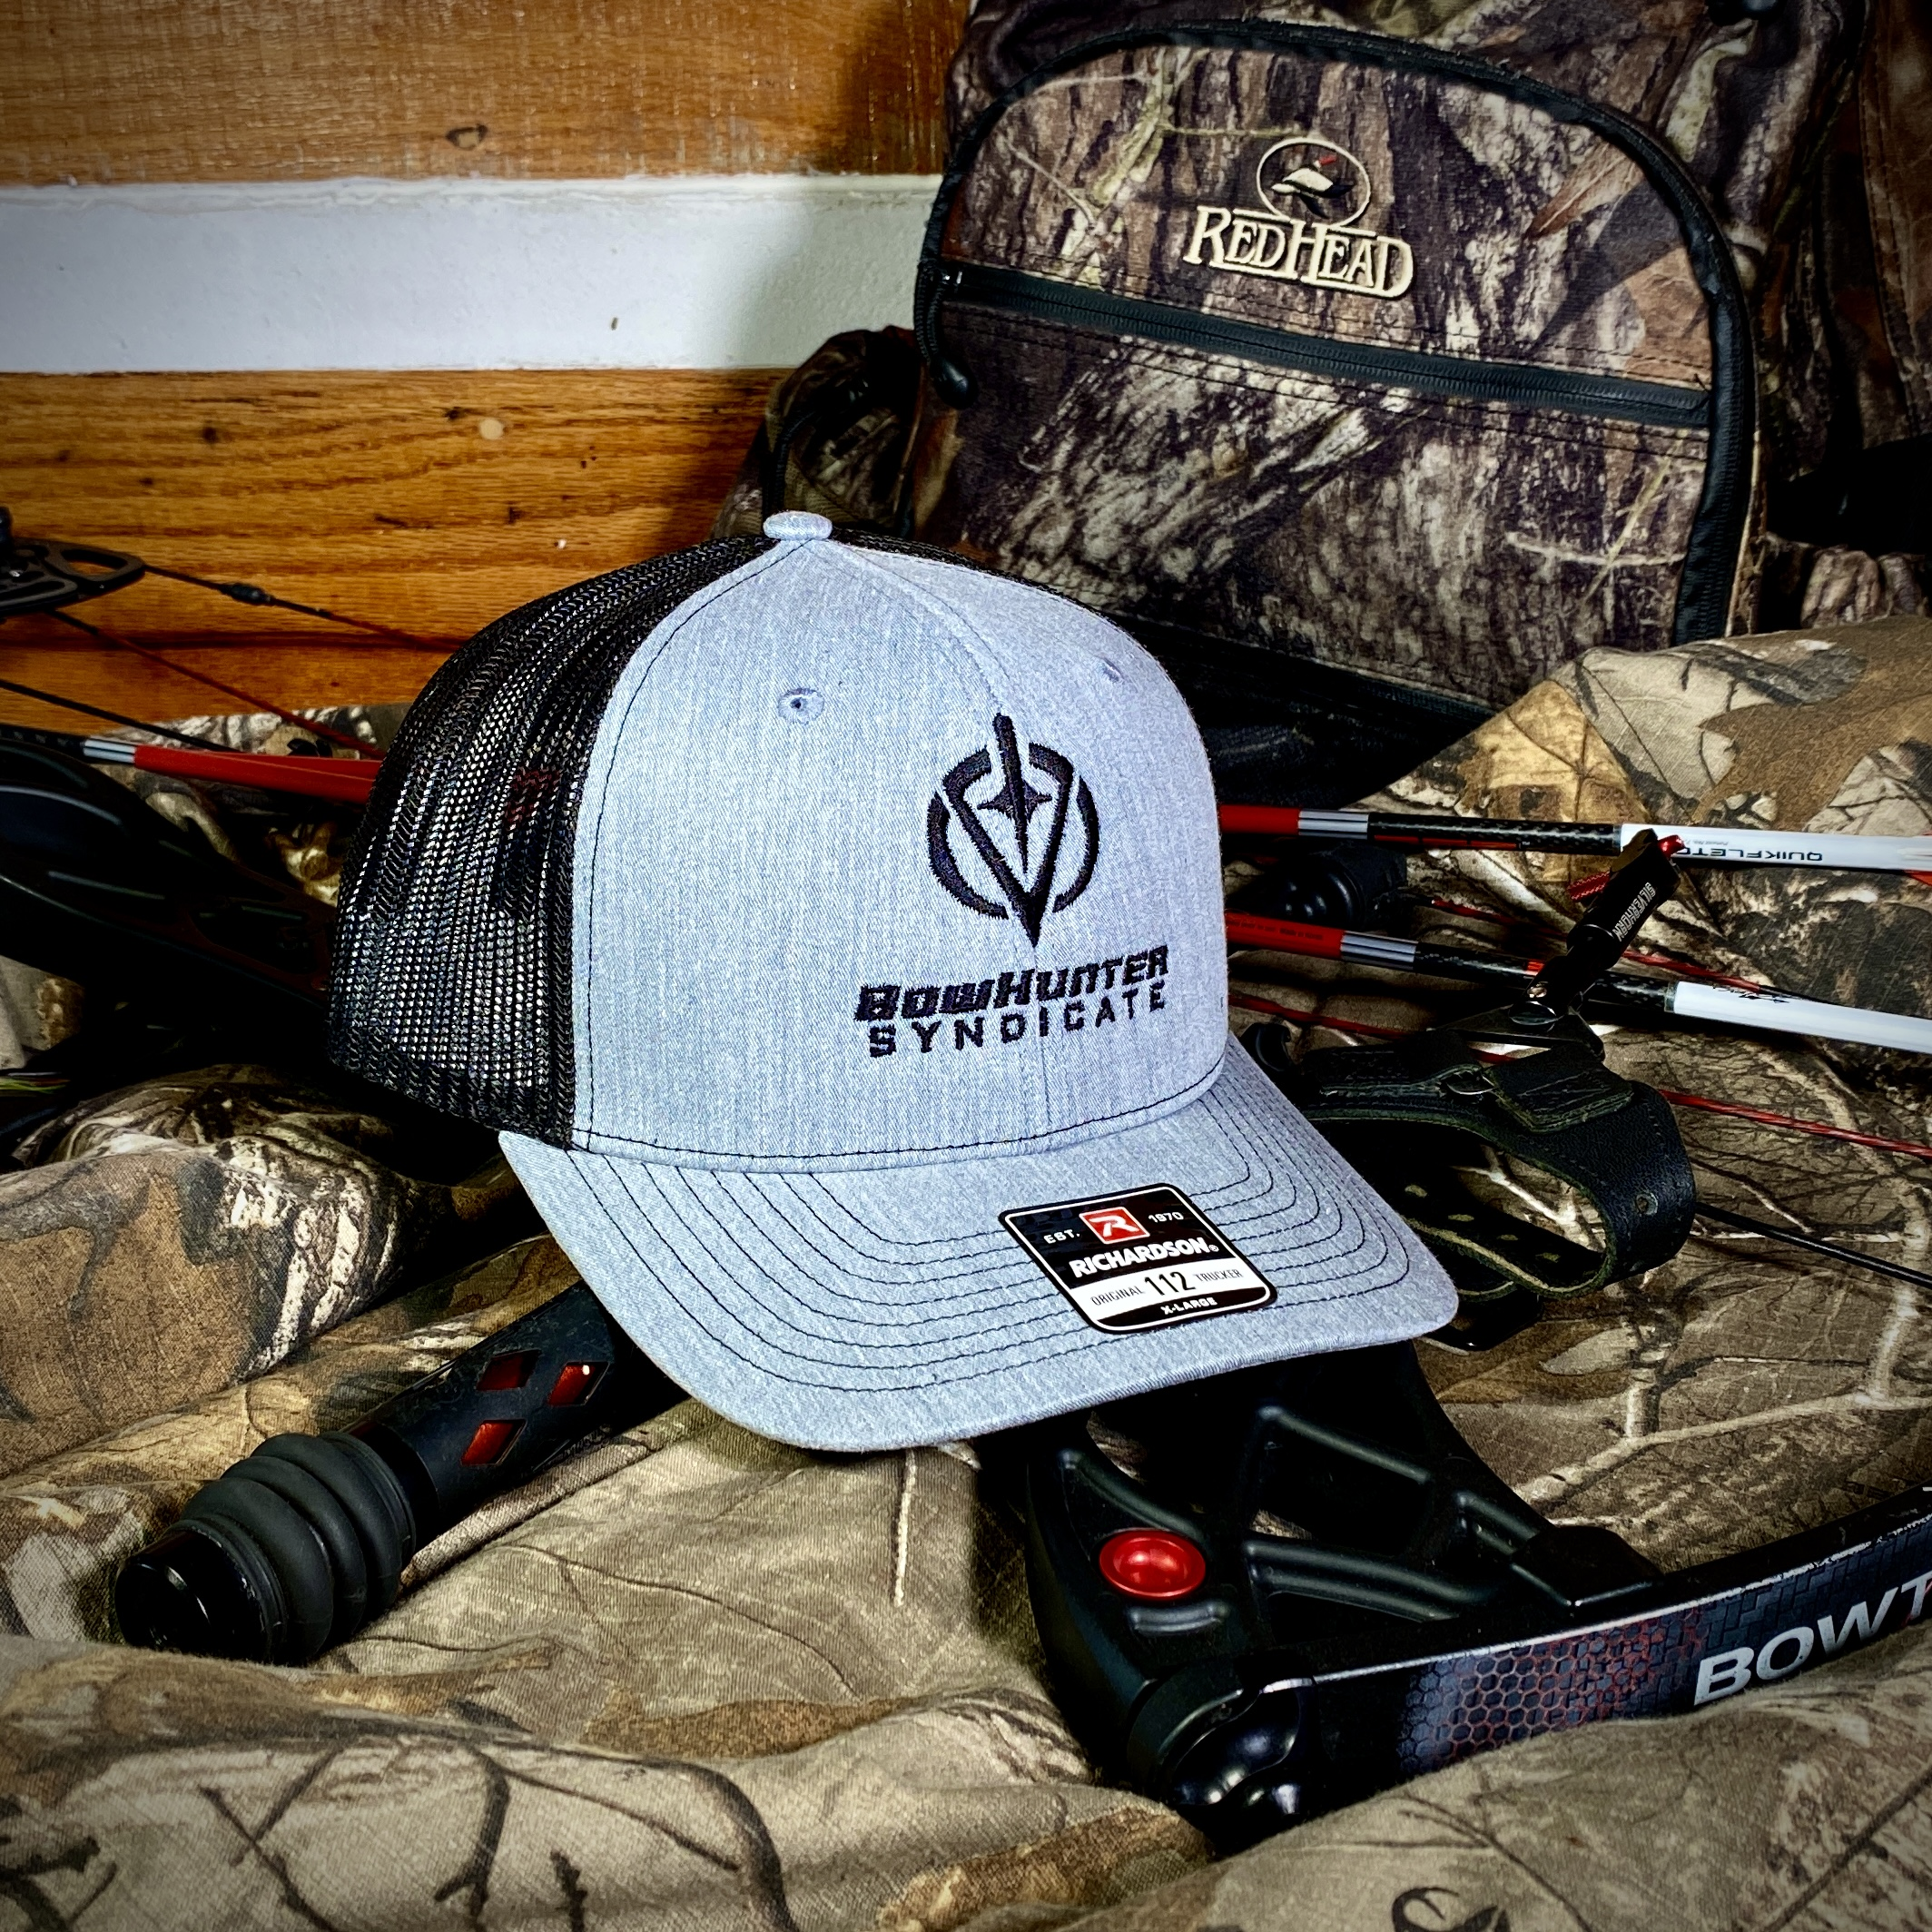 Bowhunter Syndicate Cap Model#112-103